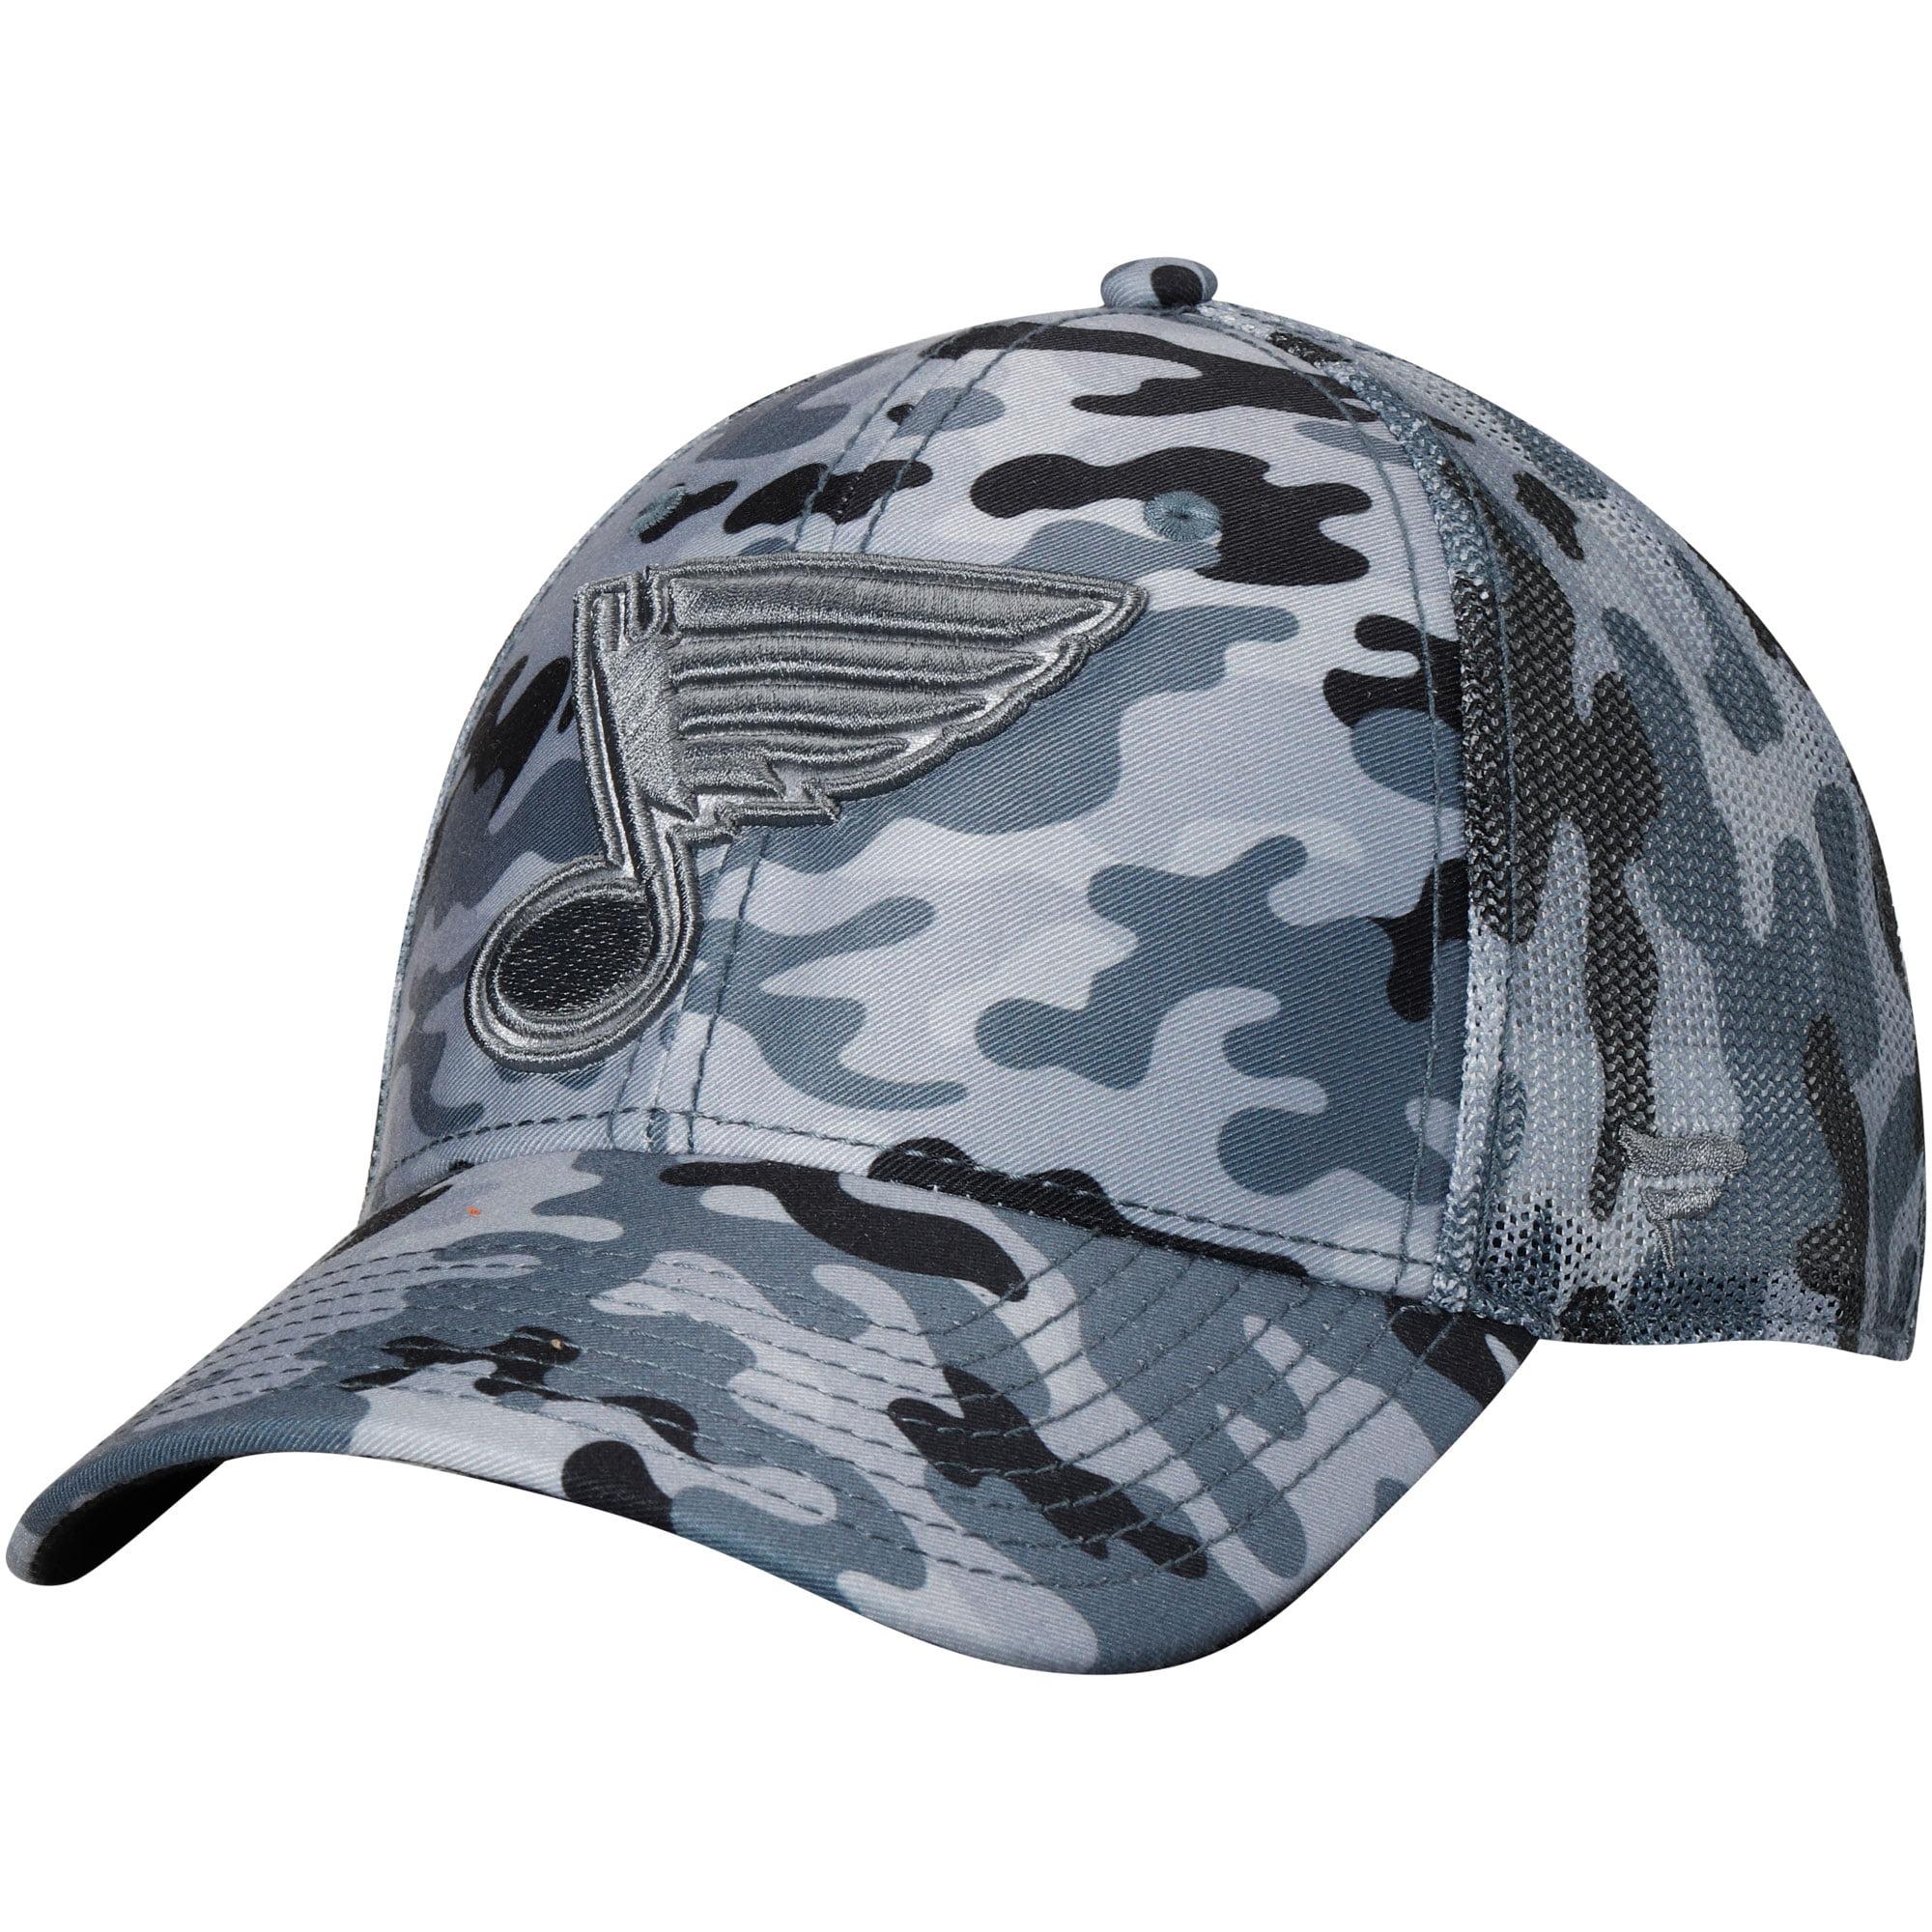 e35249cb5976f ... spain st. louis blues fanatics branded urban trucker adjustable hat  camo gray osfa d8aca b614d